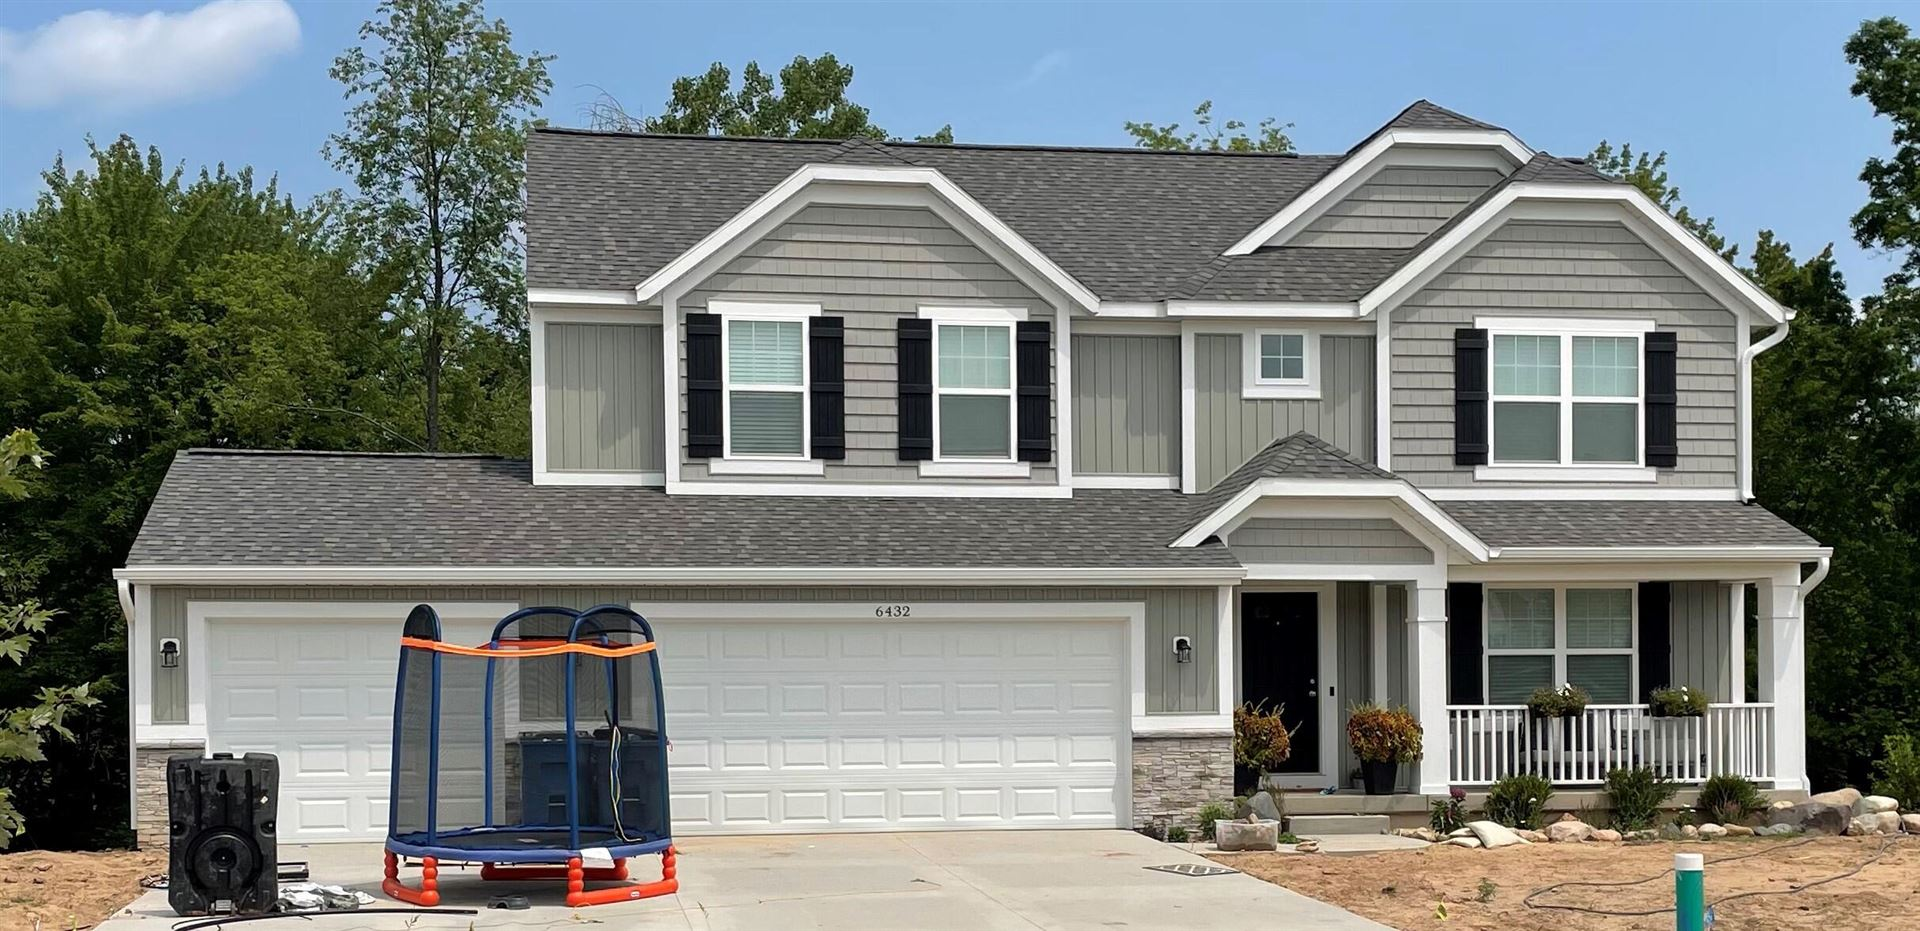 1758 Solitude Drive NE, Grand Rapids, MI 49525 - MLS#: 21097127